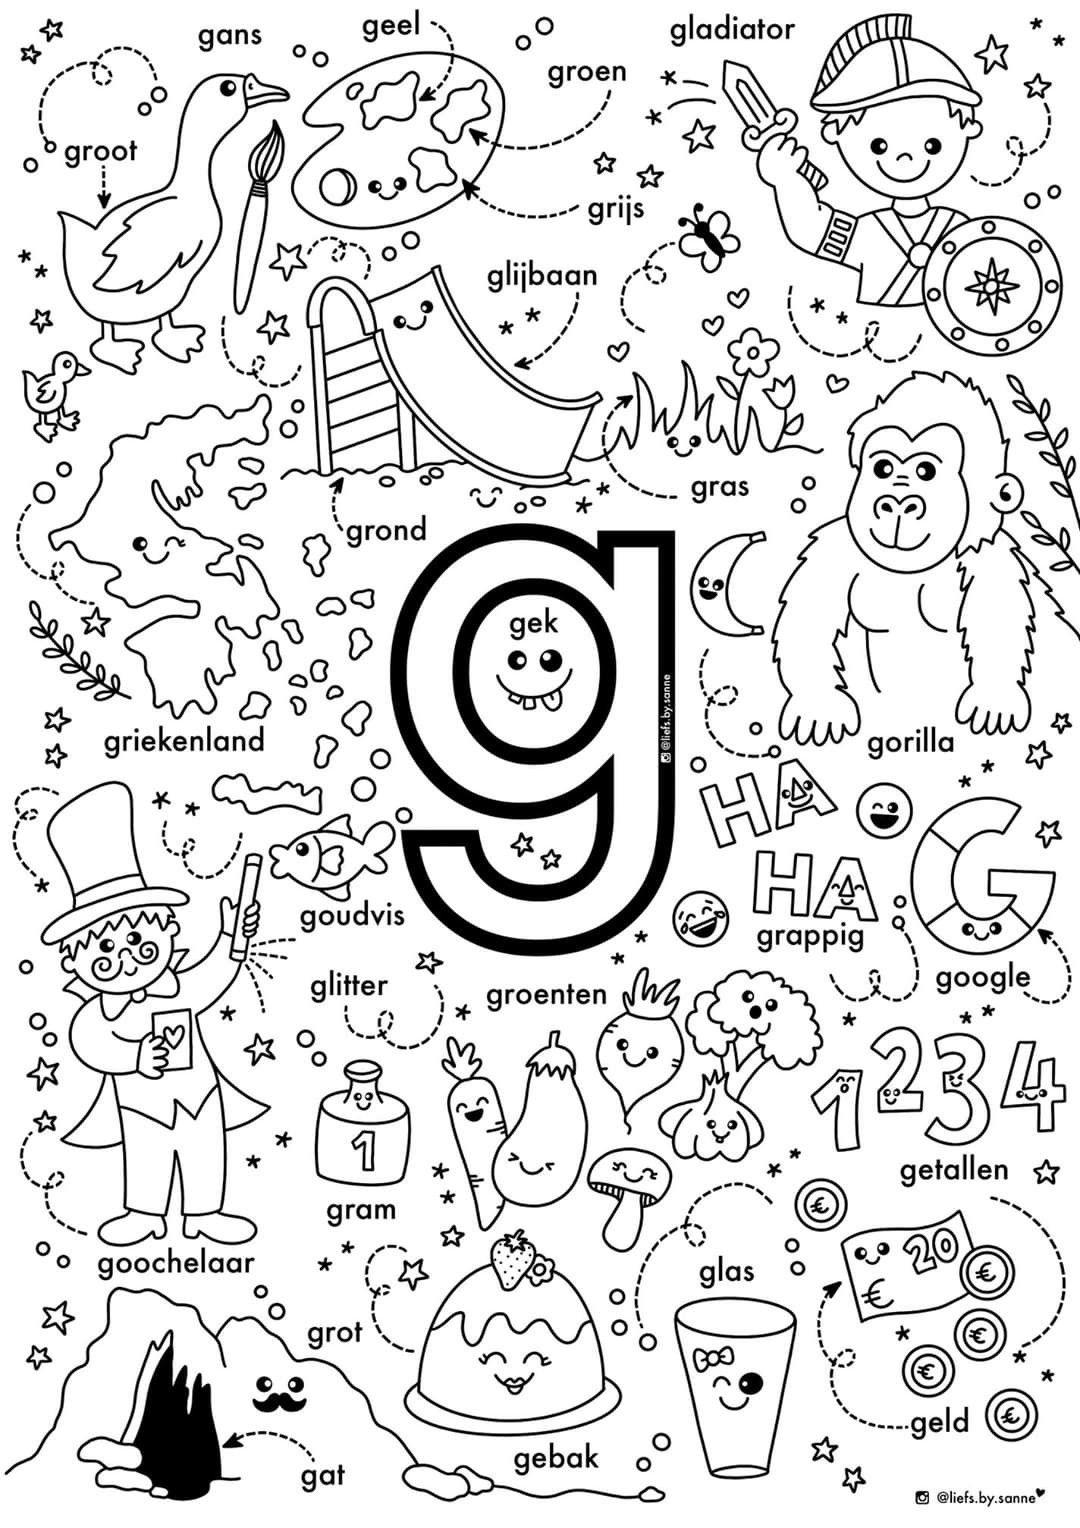 G Woorden Kleurplaat Letterherkenning Spelletjes Letterherkenning Alfabet Boek